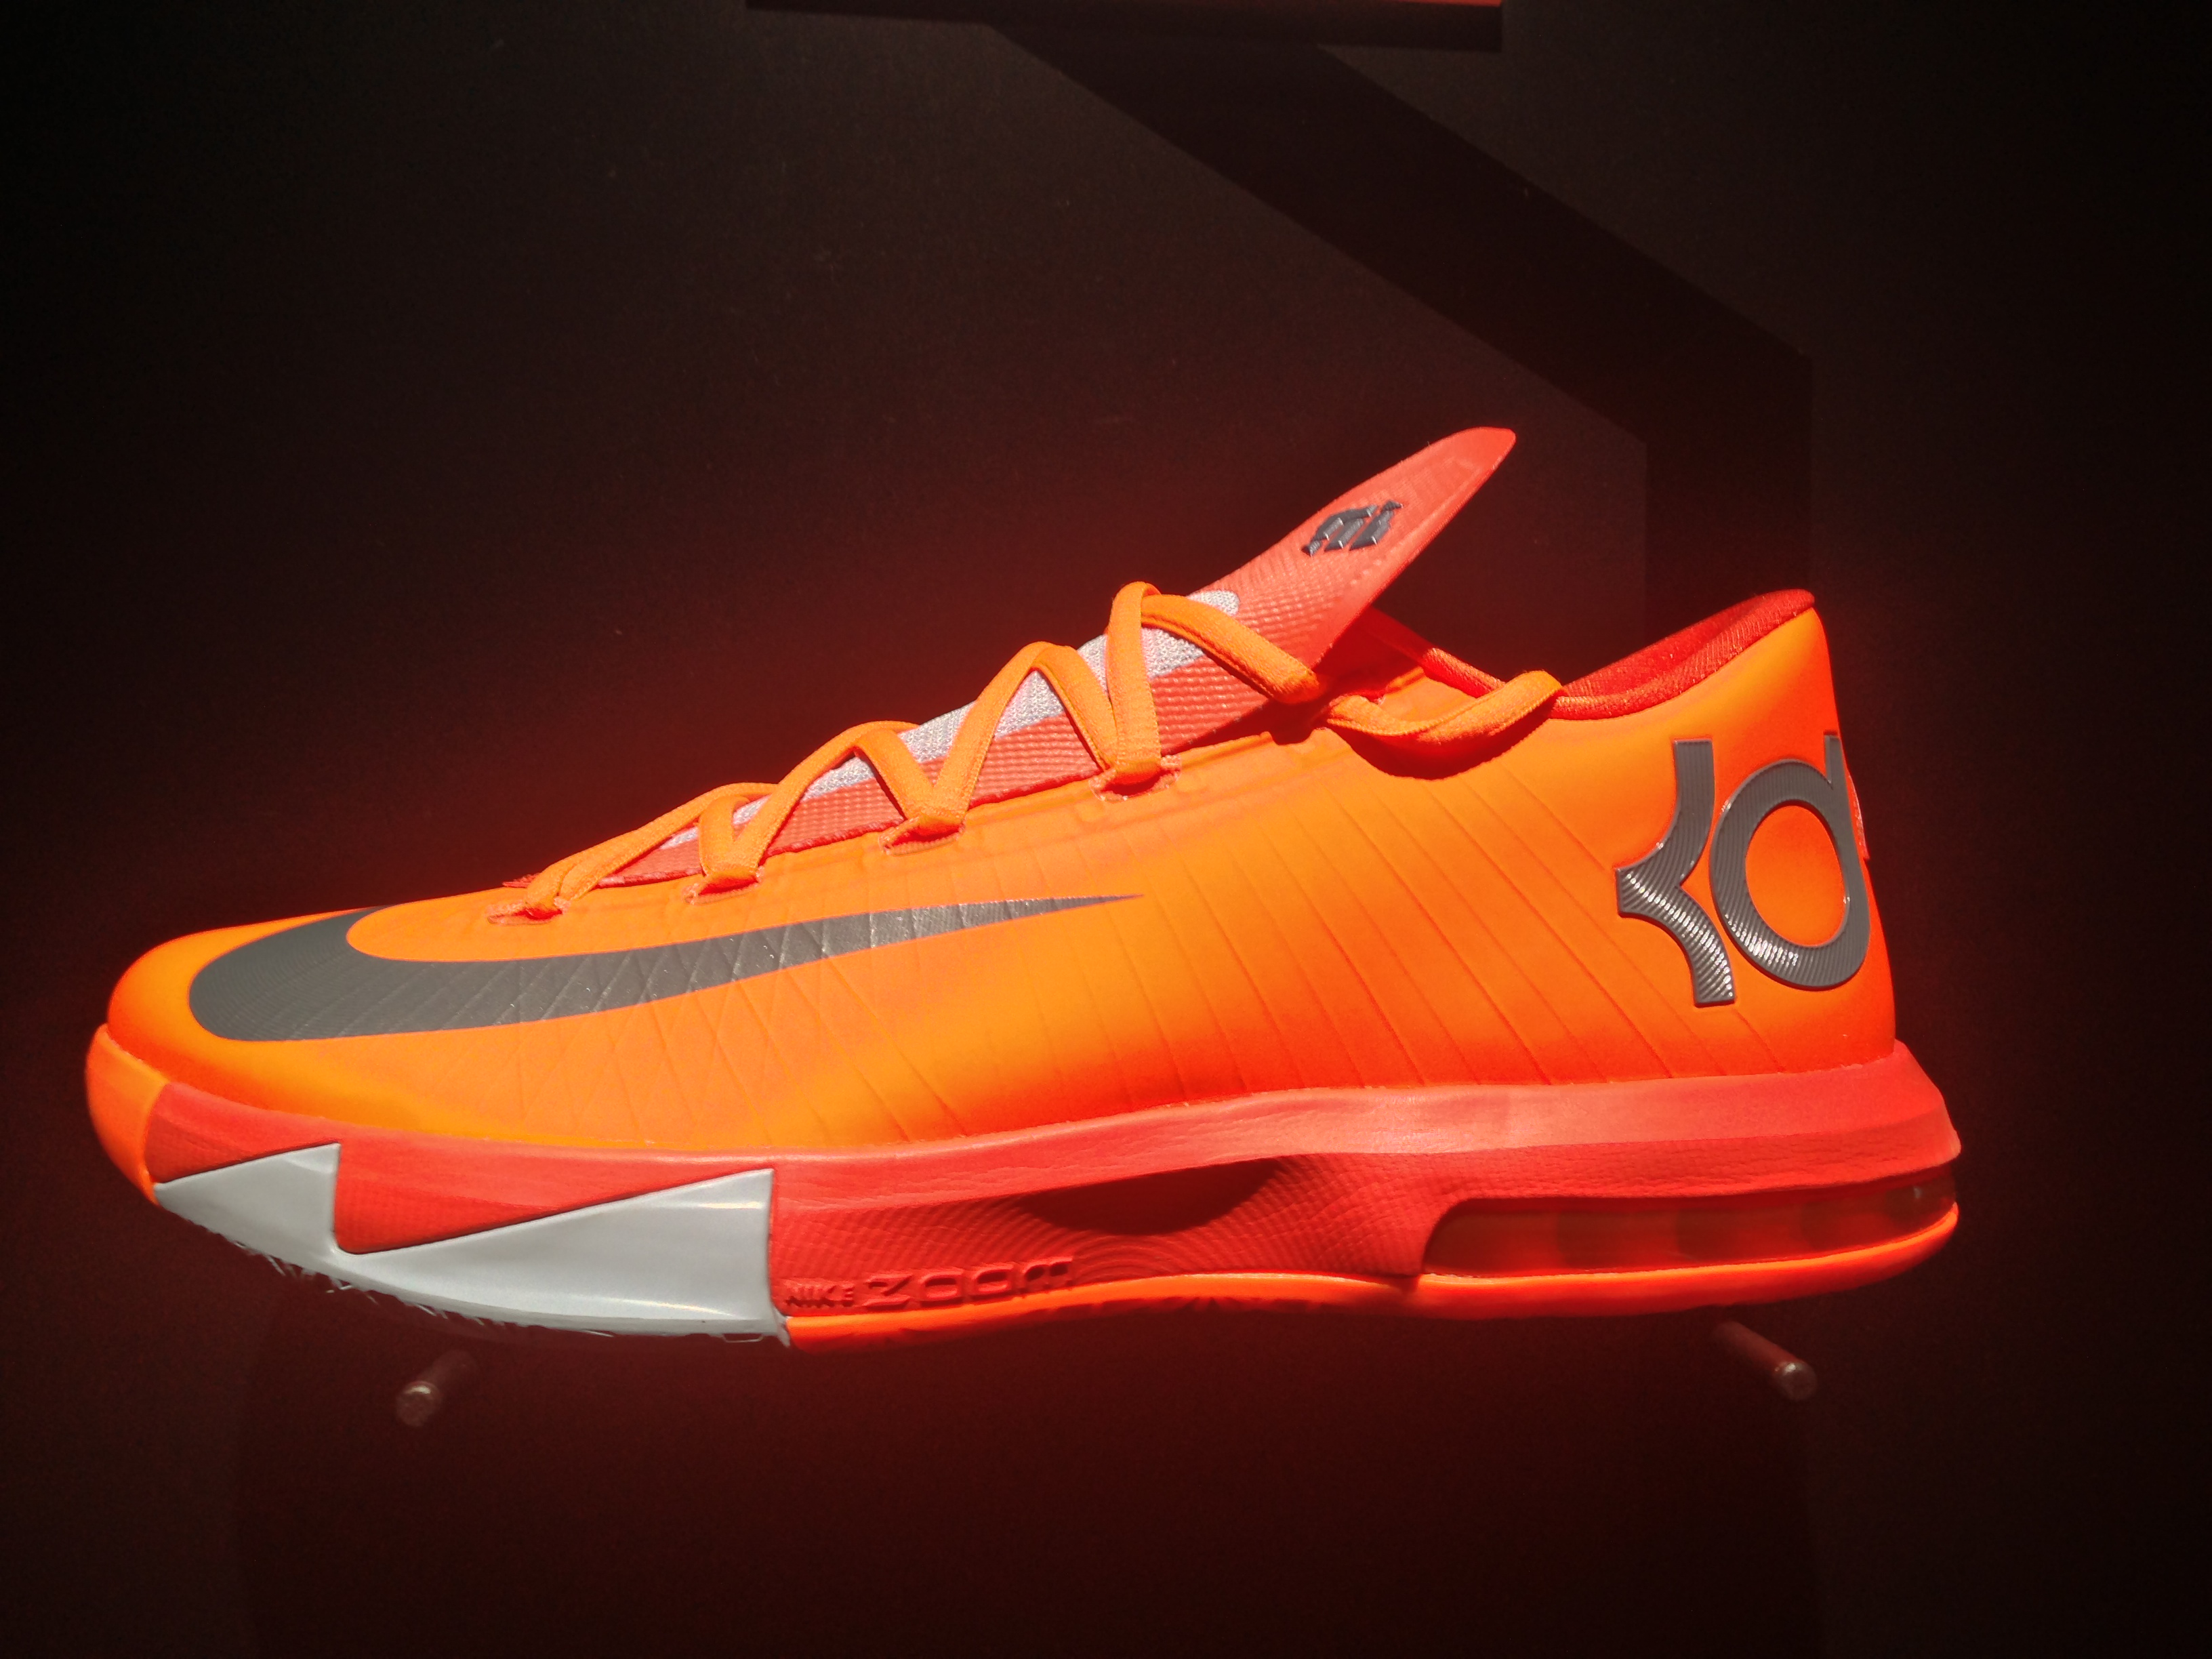 Kevin Durants Nike KD VI Shoe Release Photos